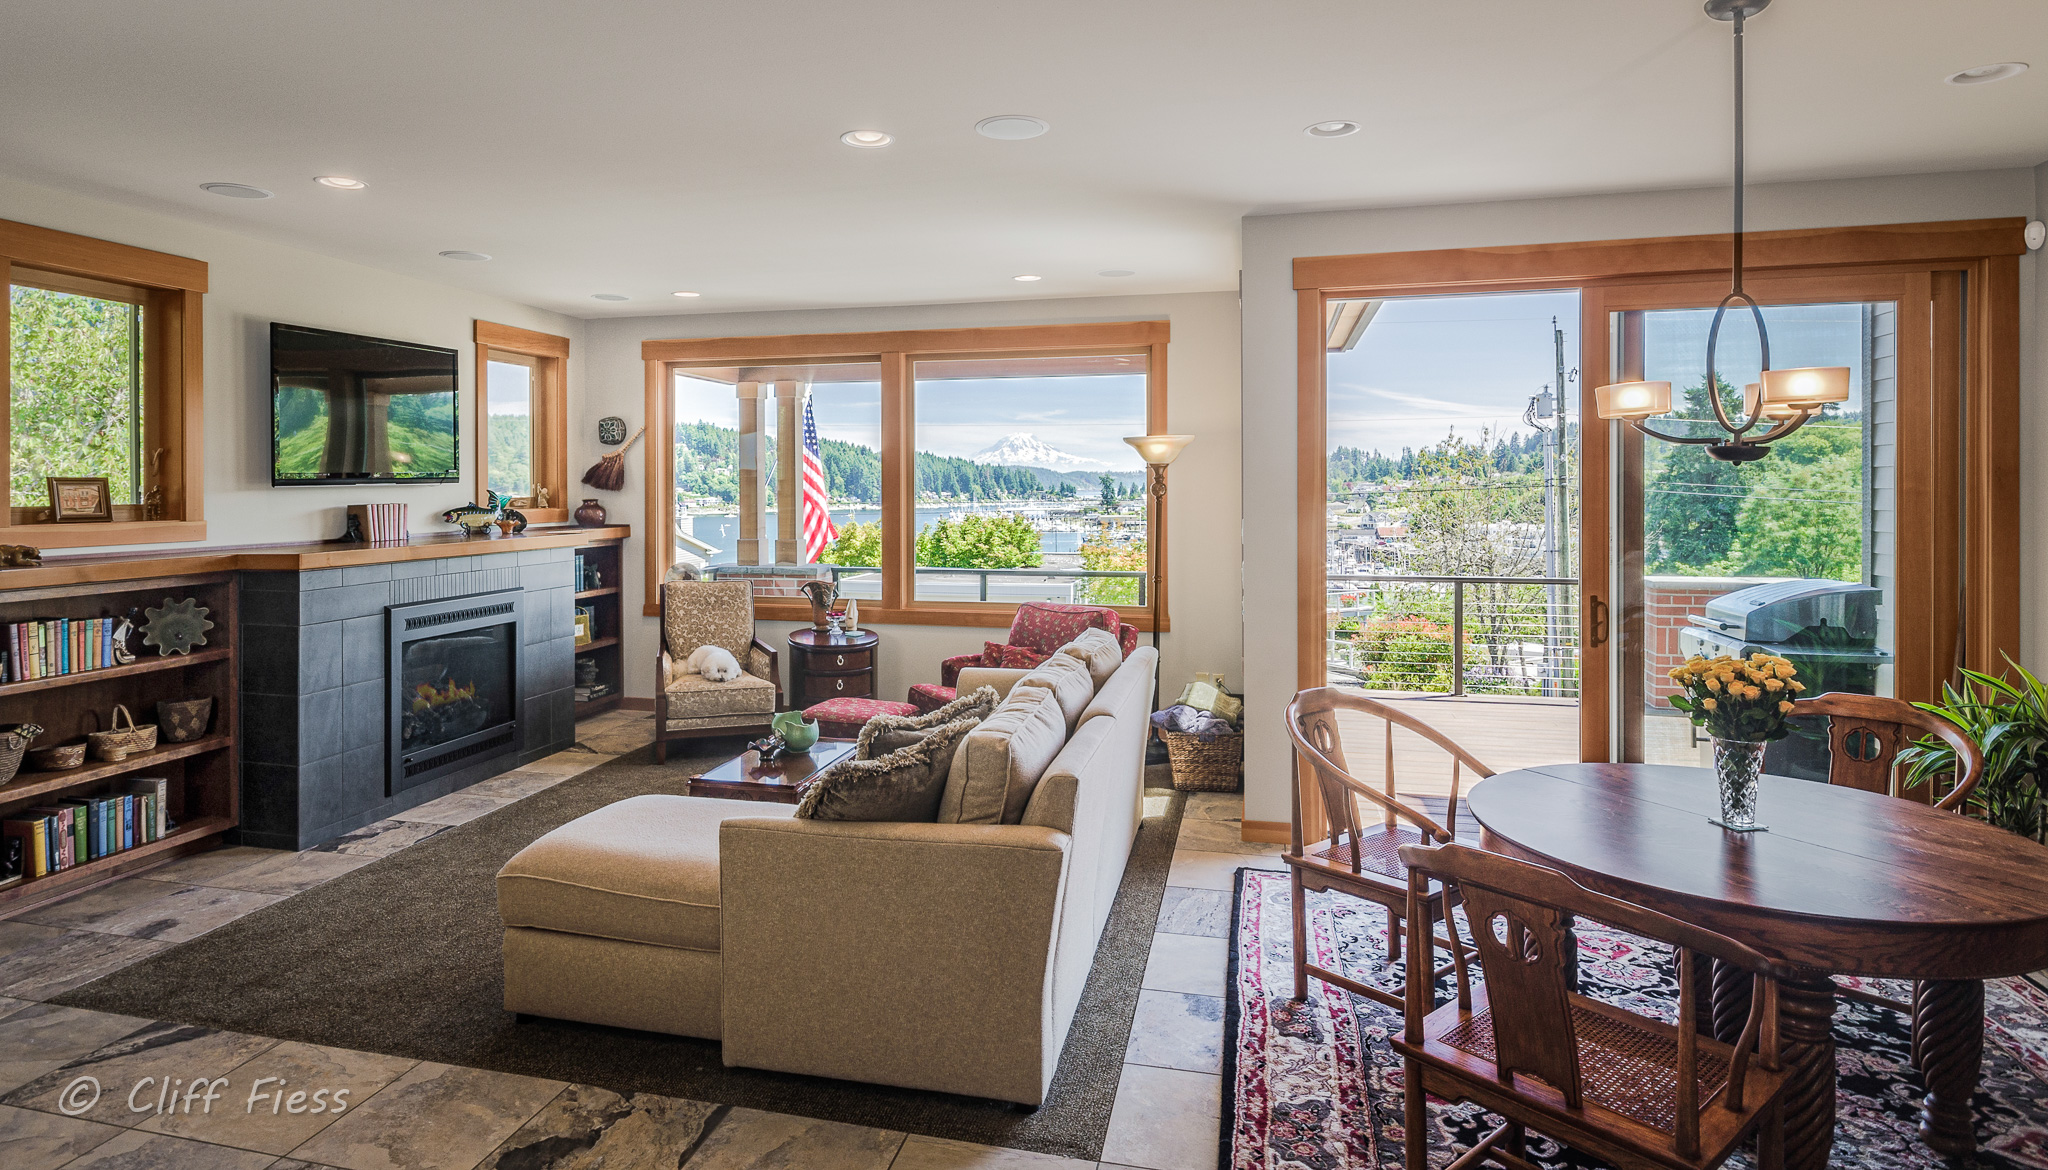 Living Room of a Gig Harbor Residence